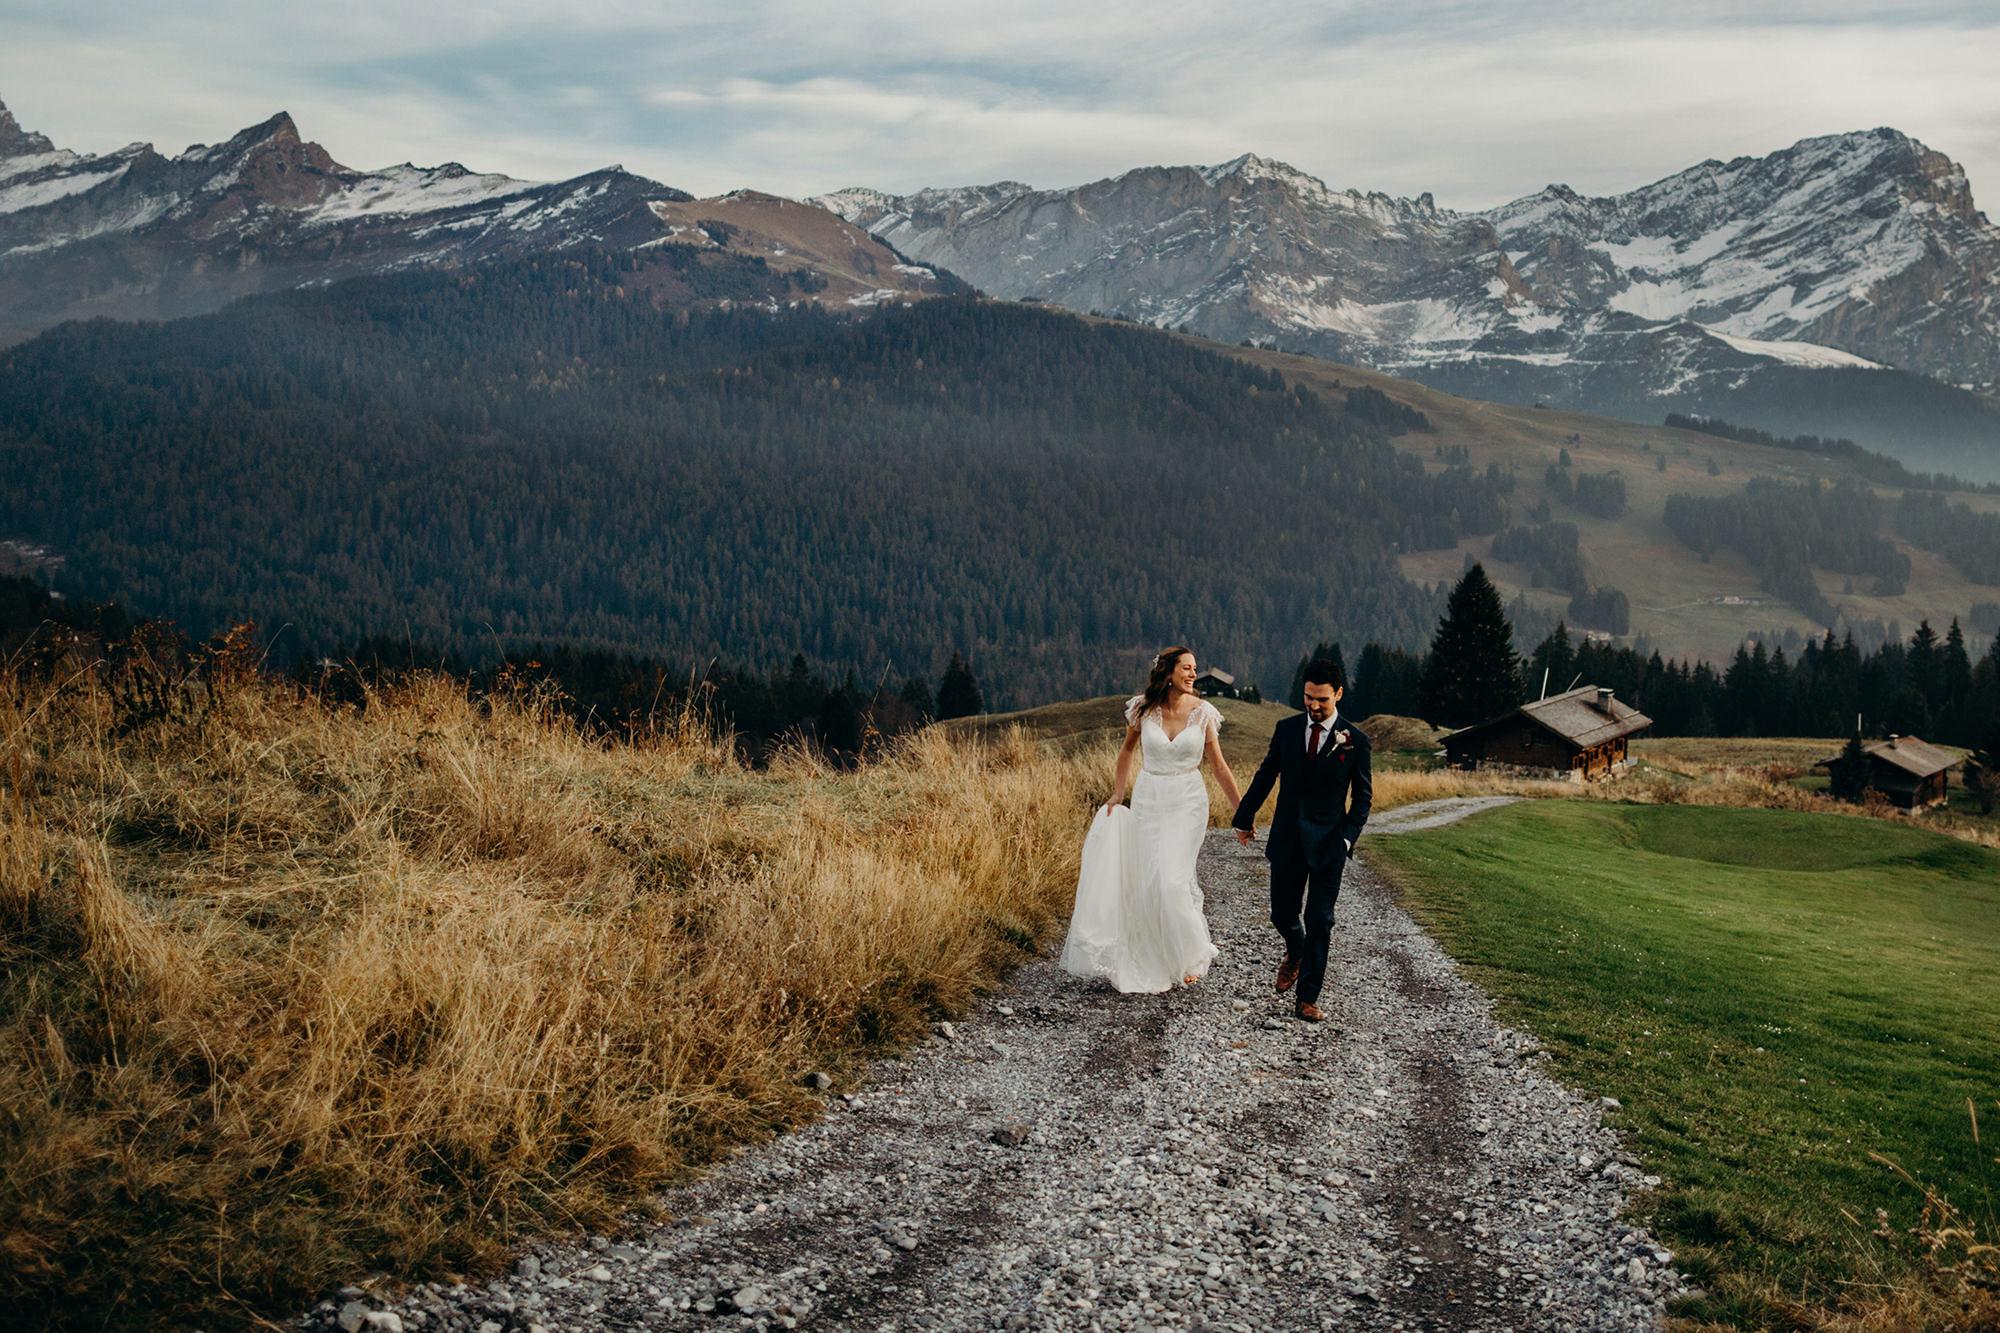 Swiss Alps Wedding